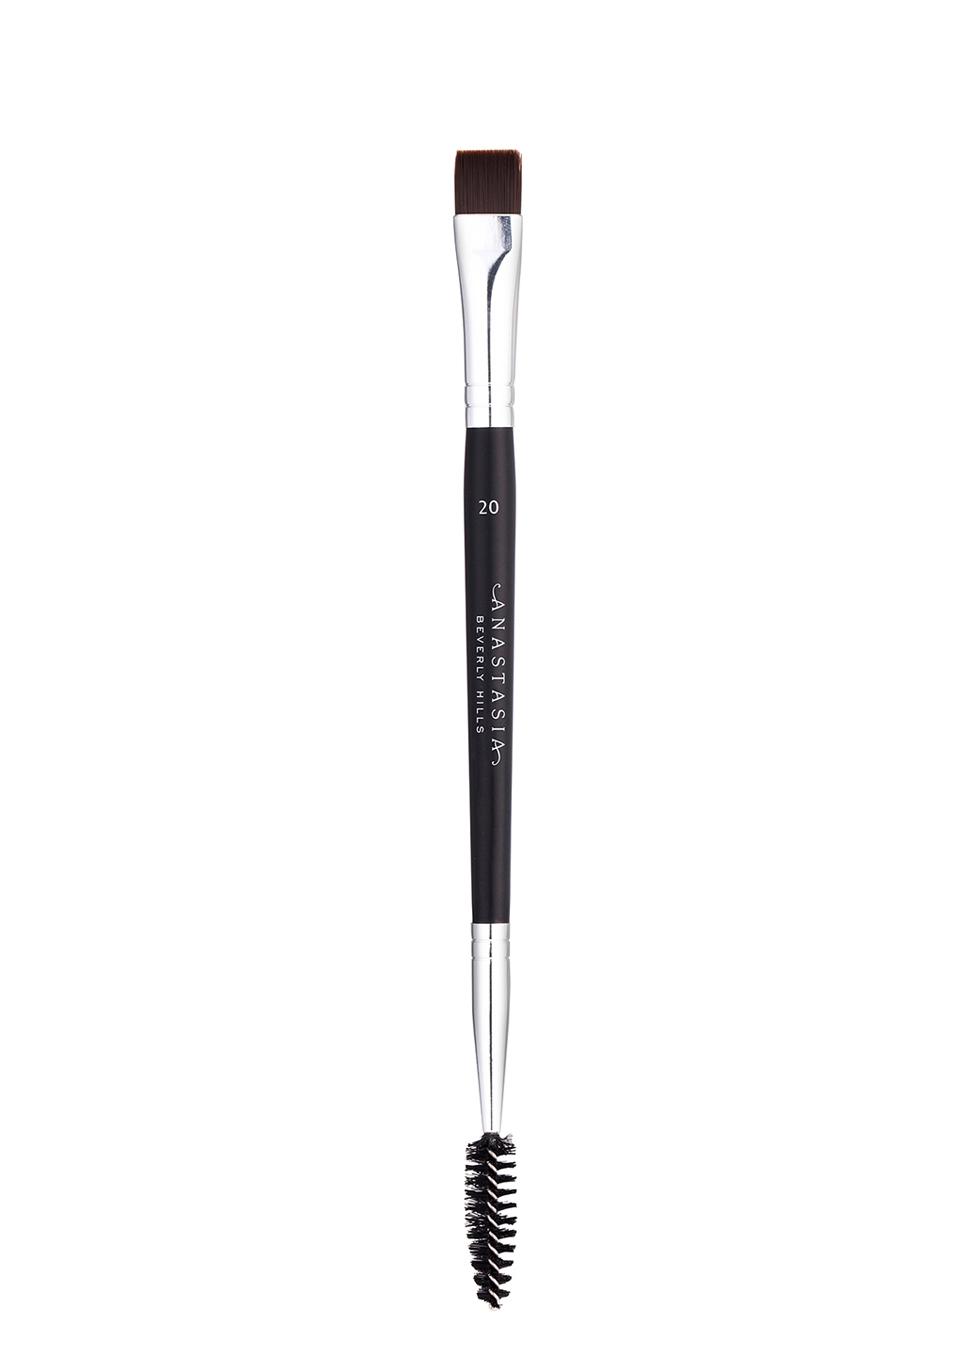 Brush 20 - Dual-Ended Flat Detail Brush